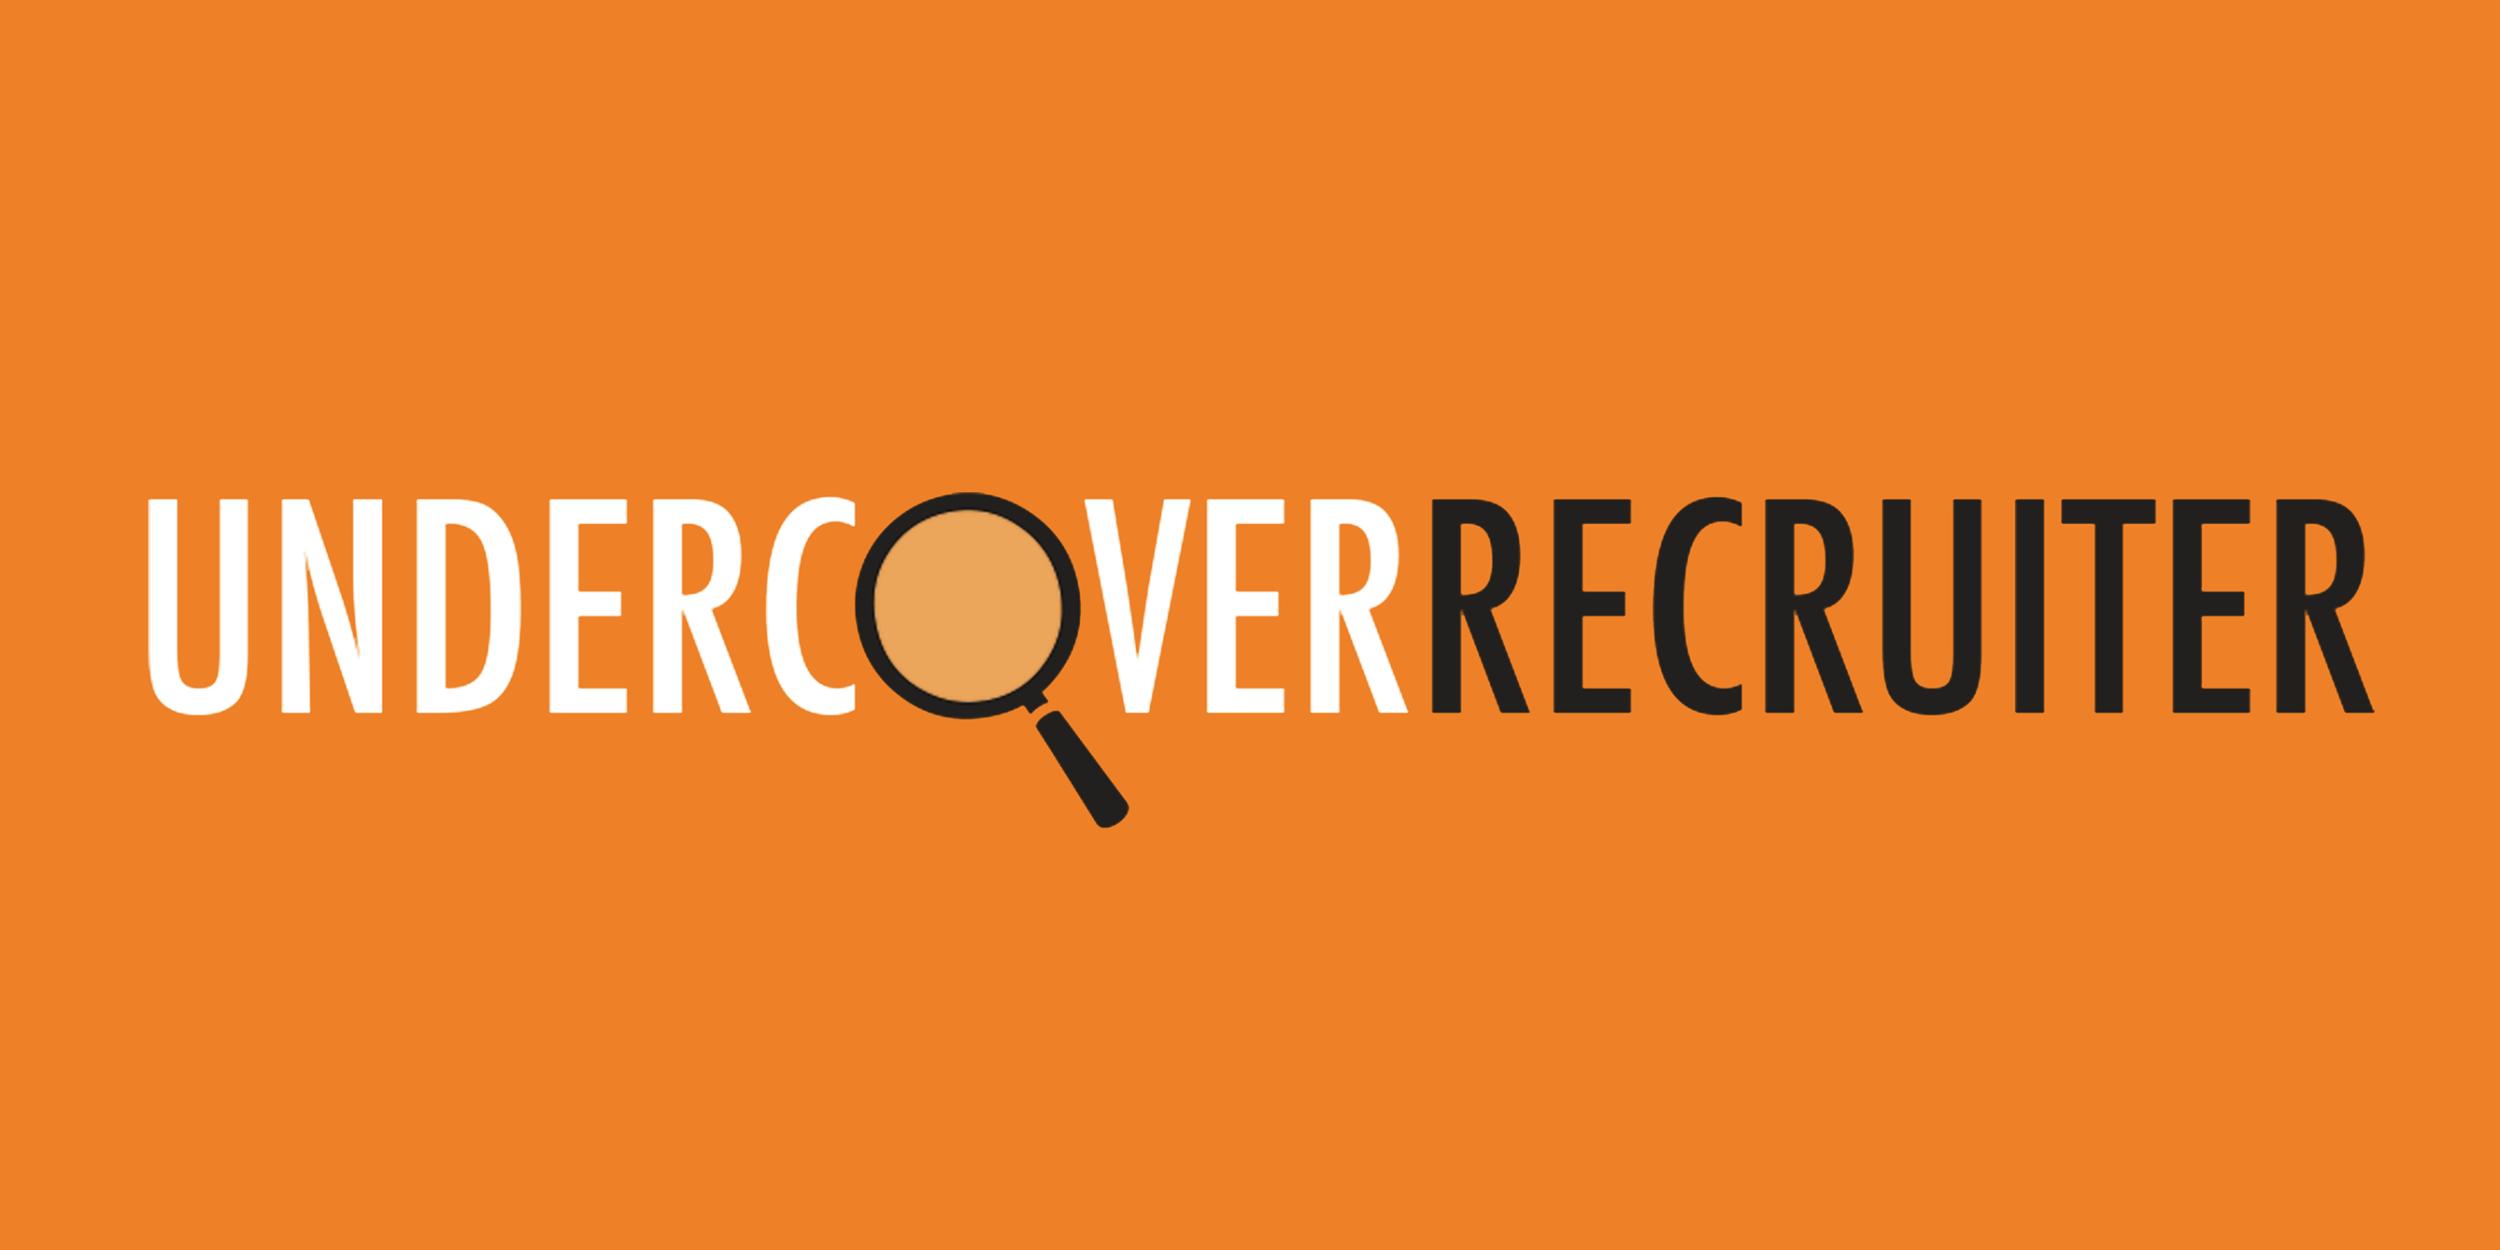 undercoverrecruiter.png